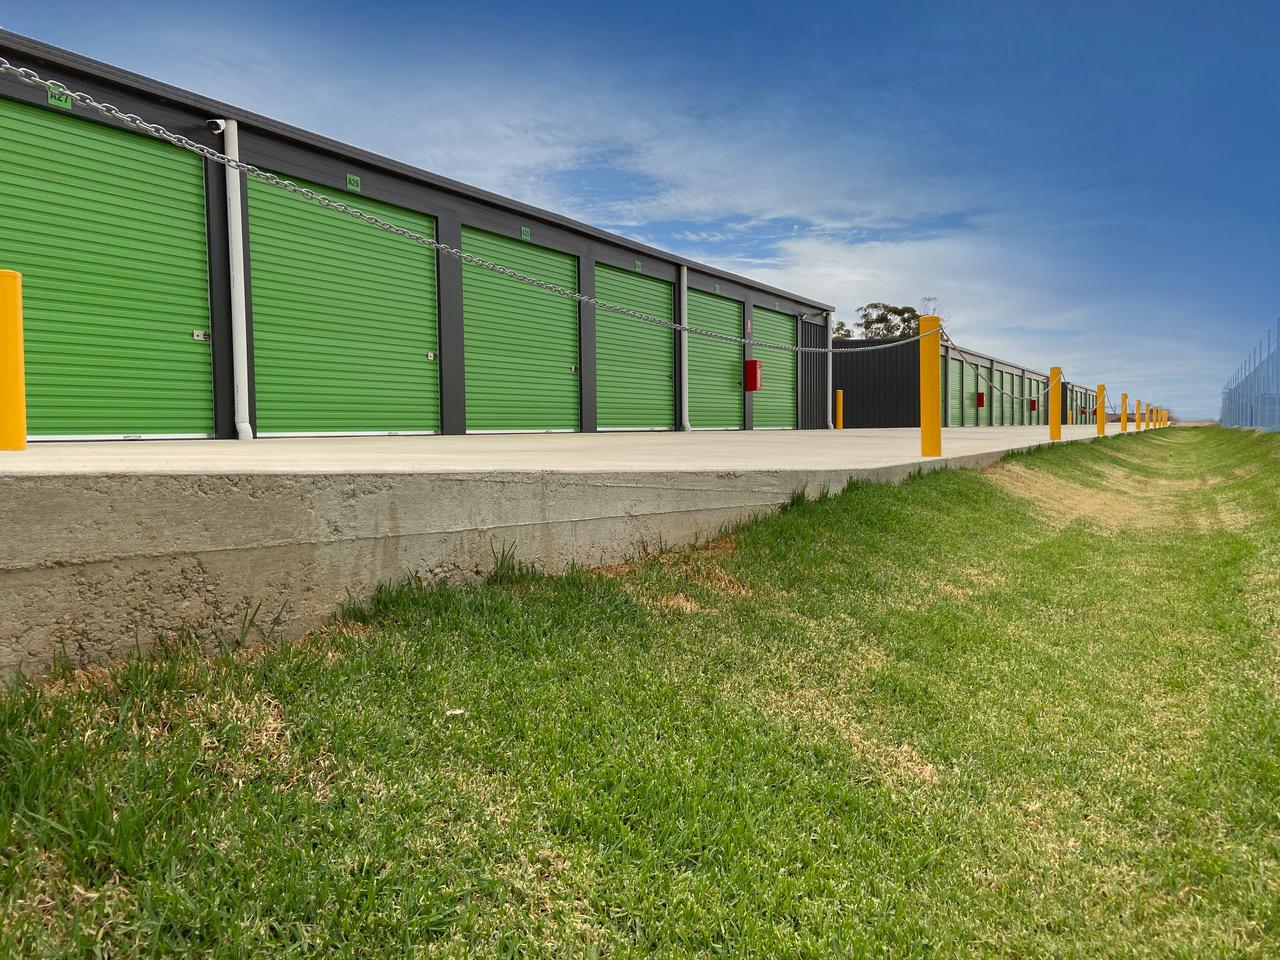 exterior of storage facility